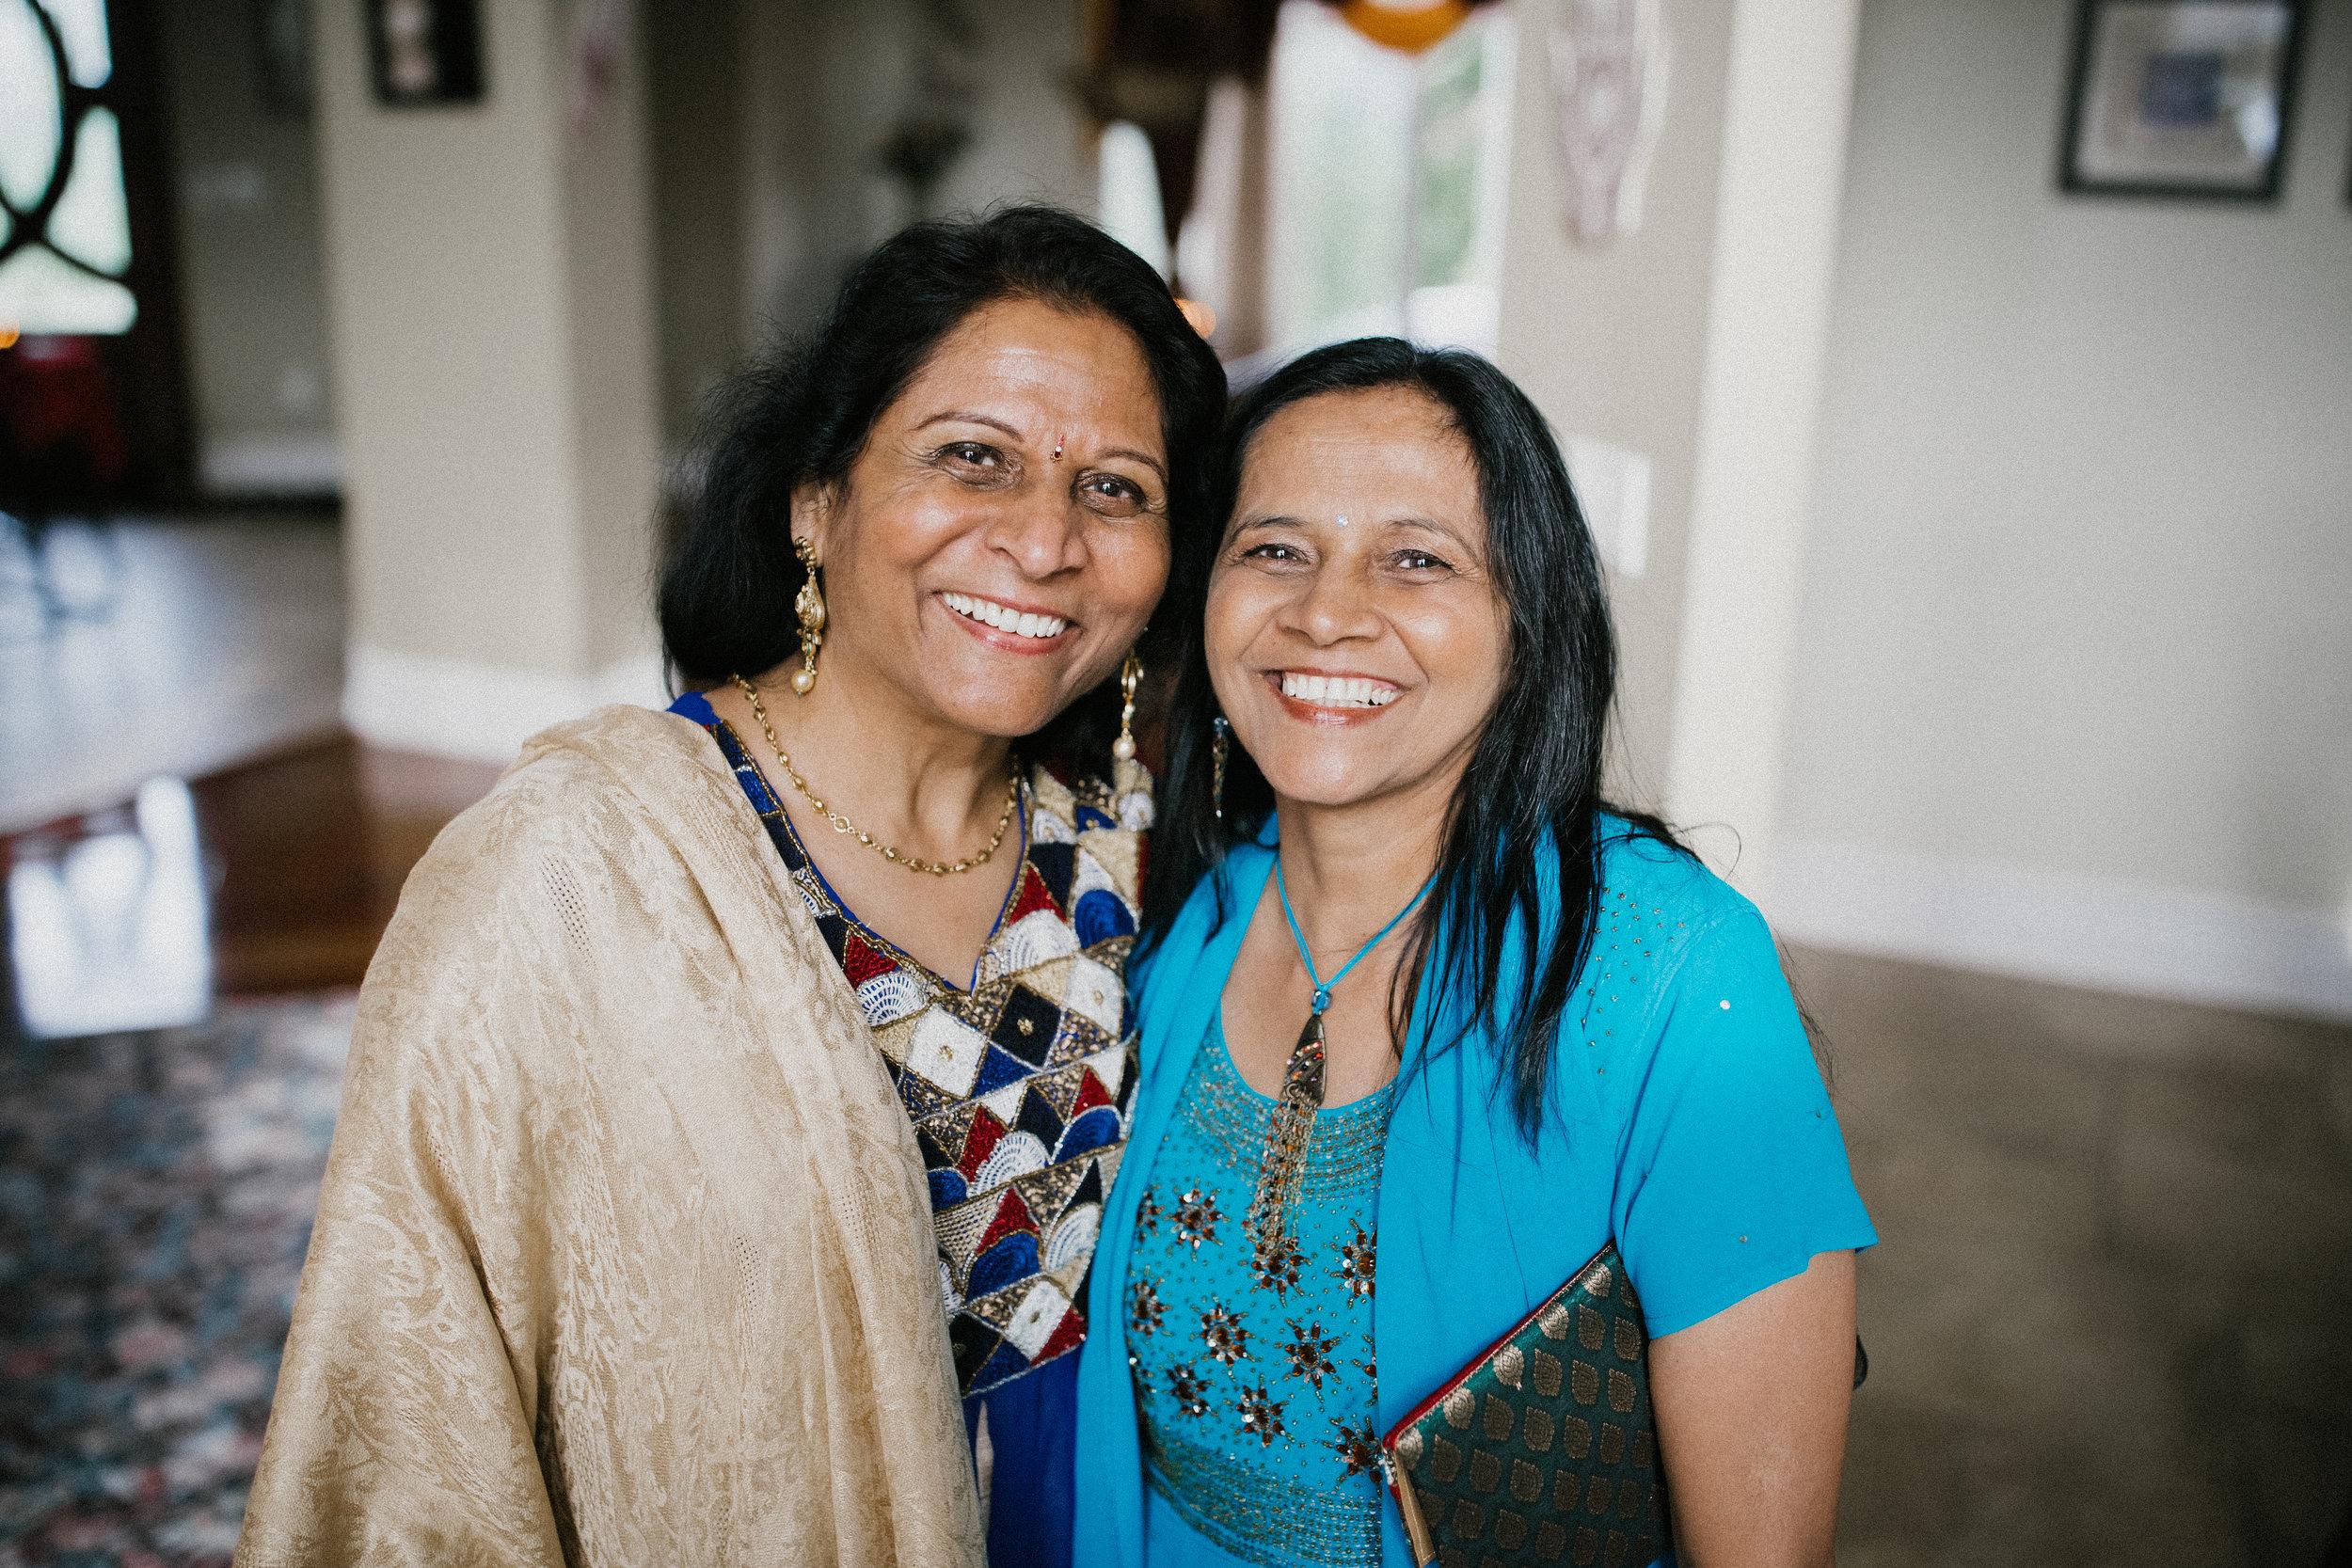 Aparna-Ankit-Patel-Mehndi-Wedding-Photos-0024.jpg